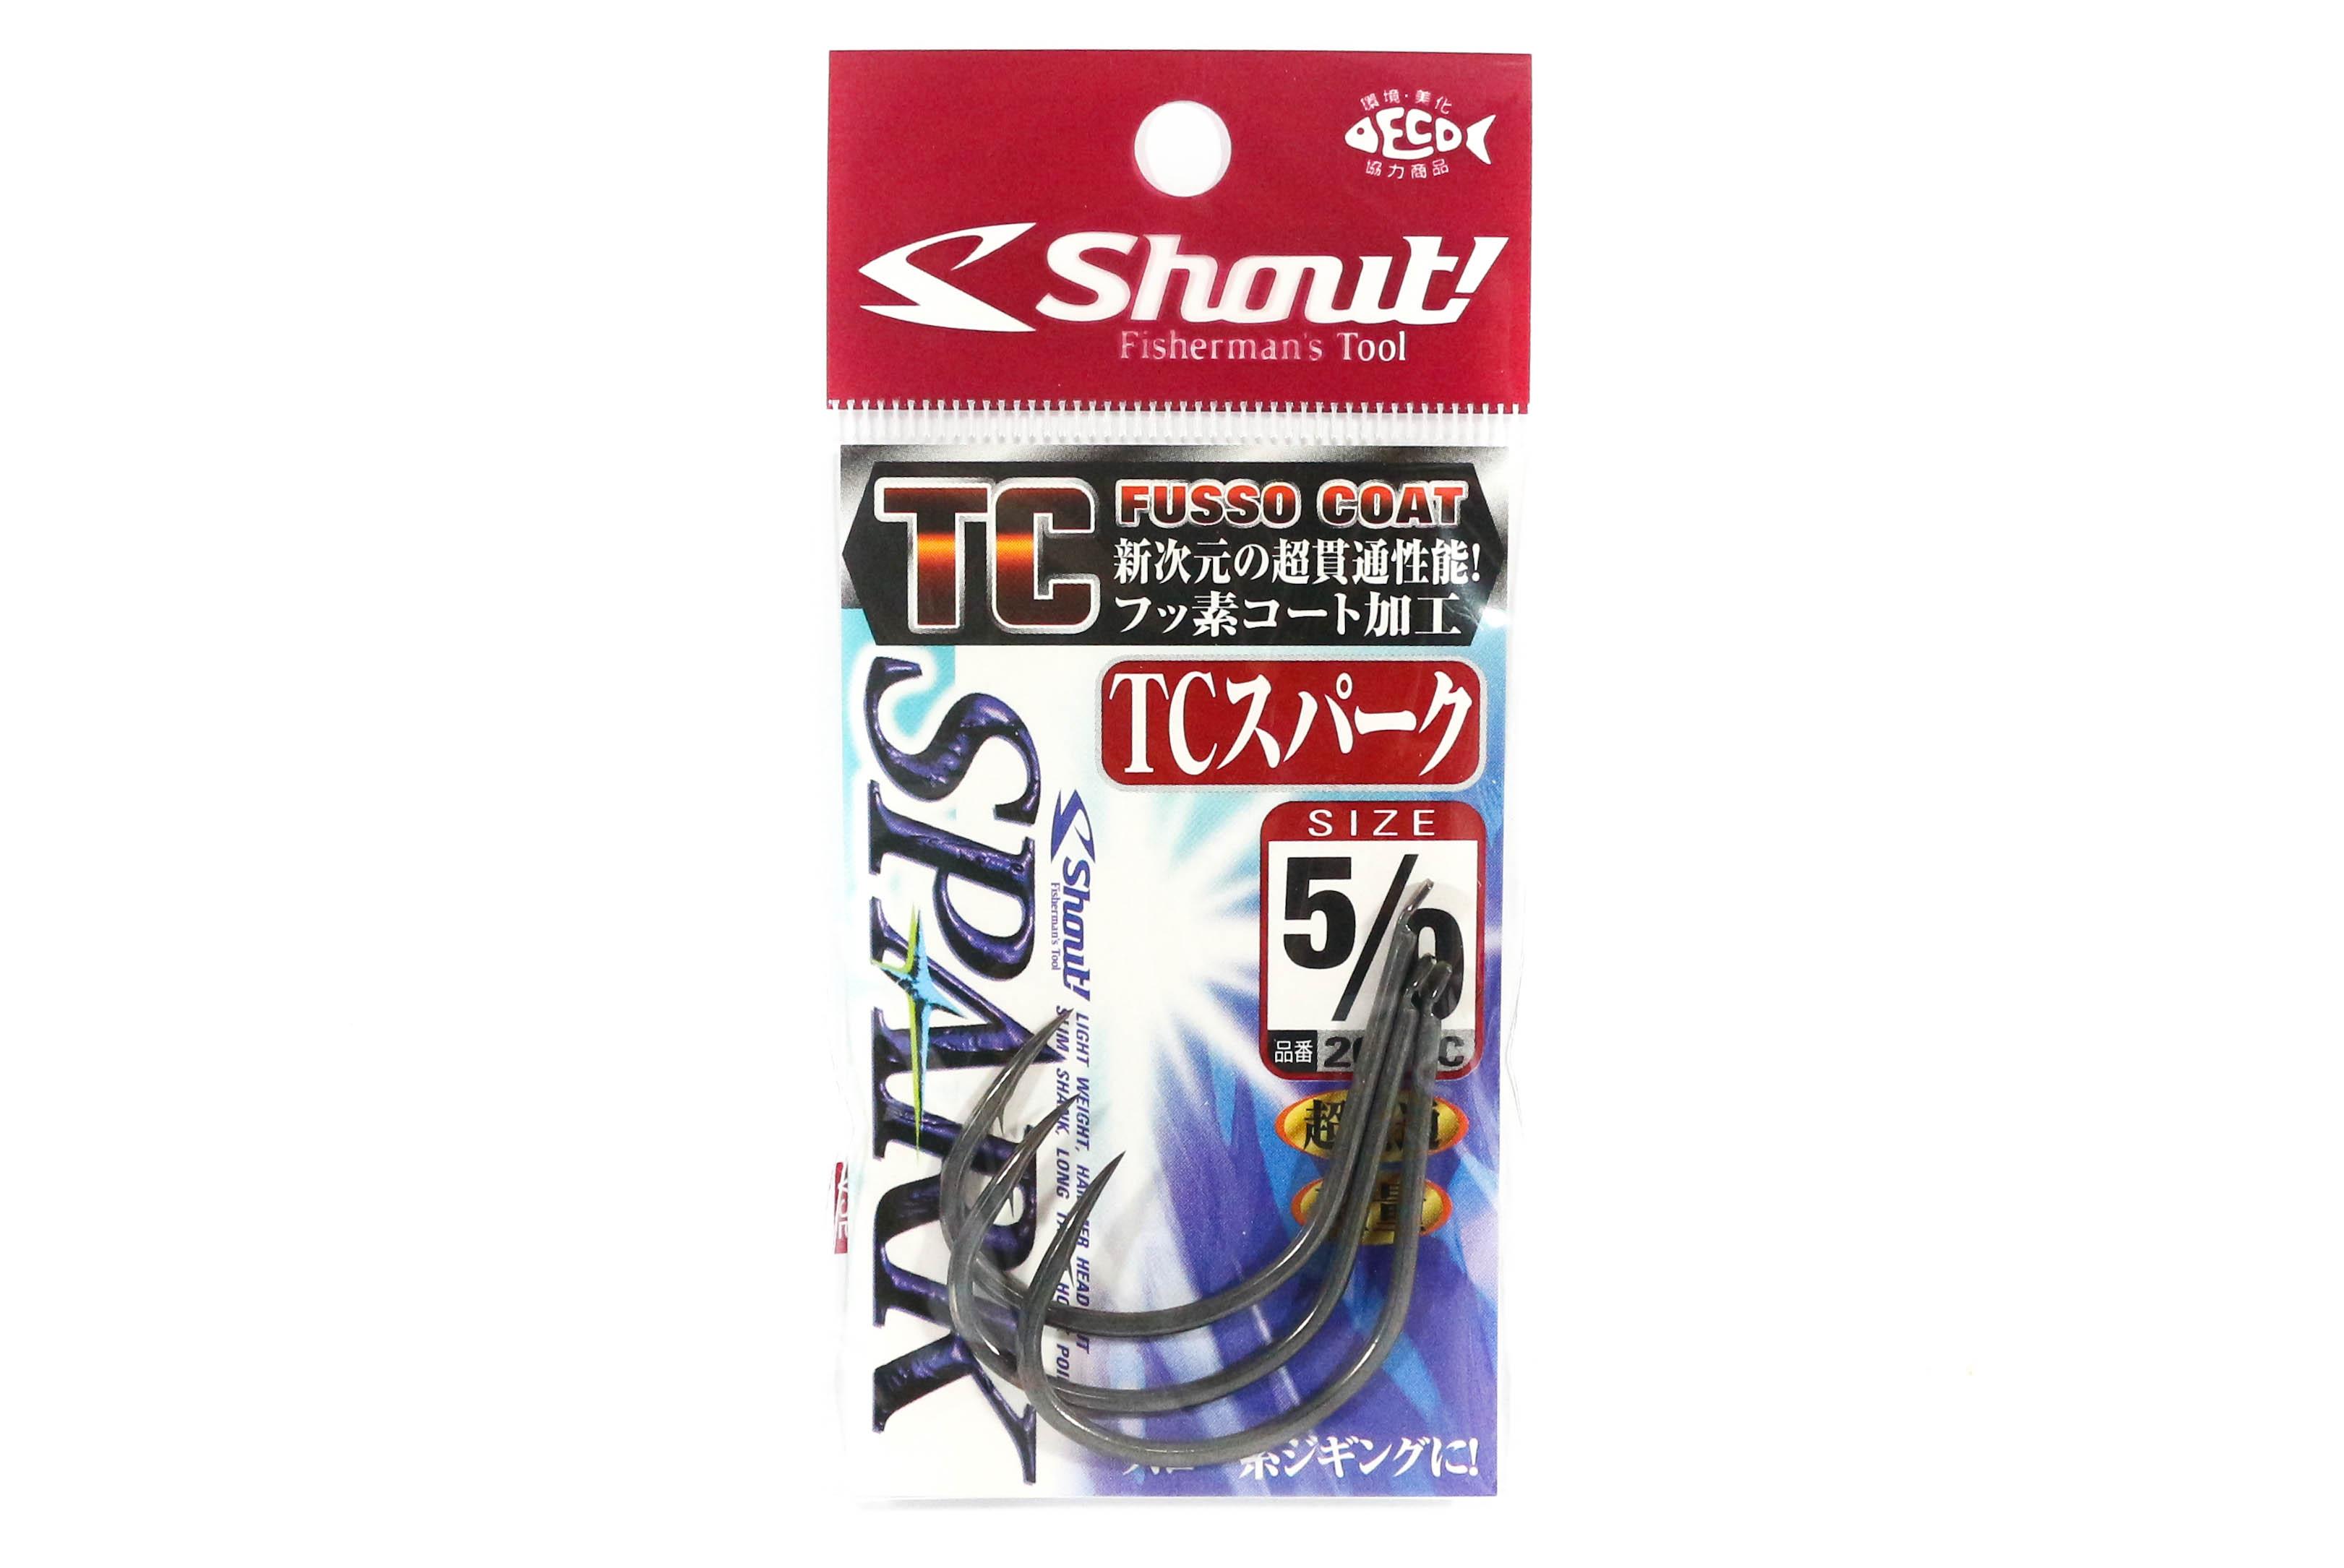 Shout 209-TC TC Spark Jigging Single Hook Size 5/0 (1960)